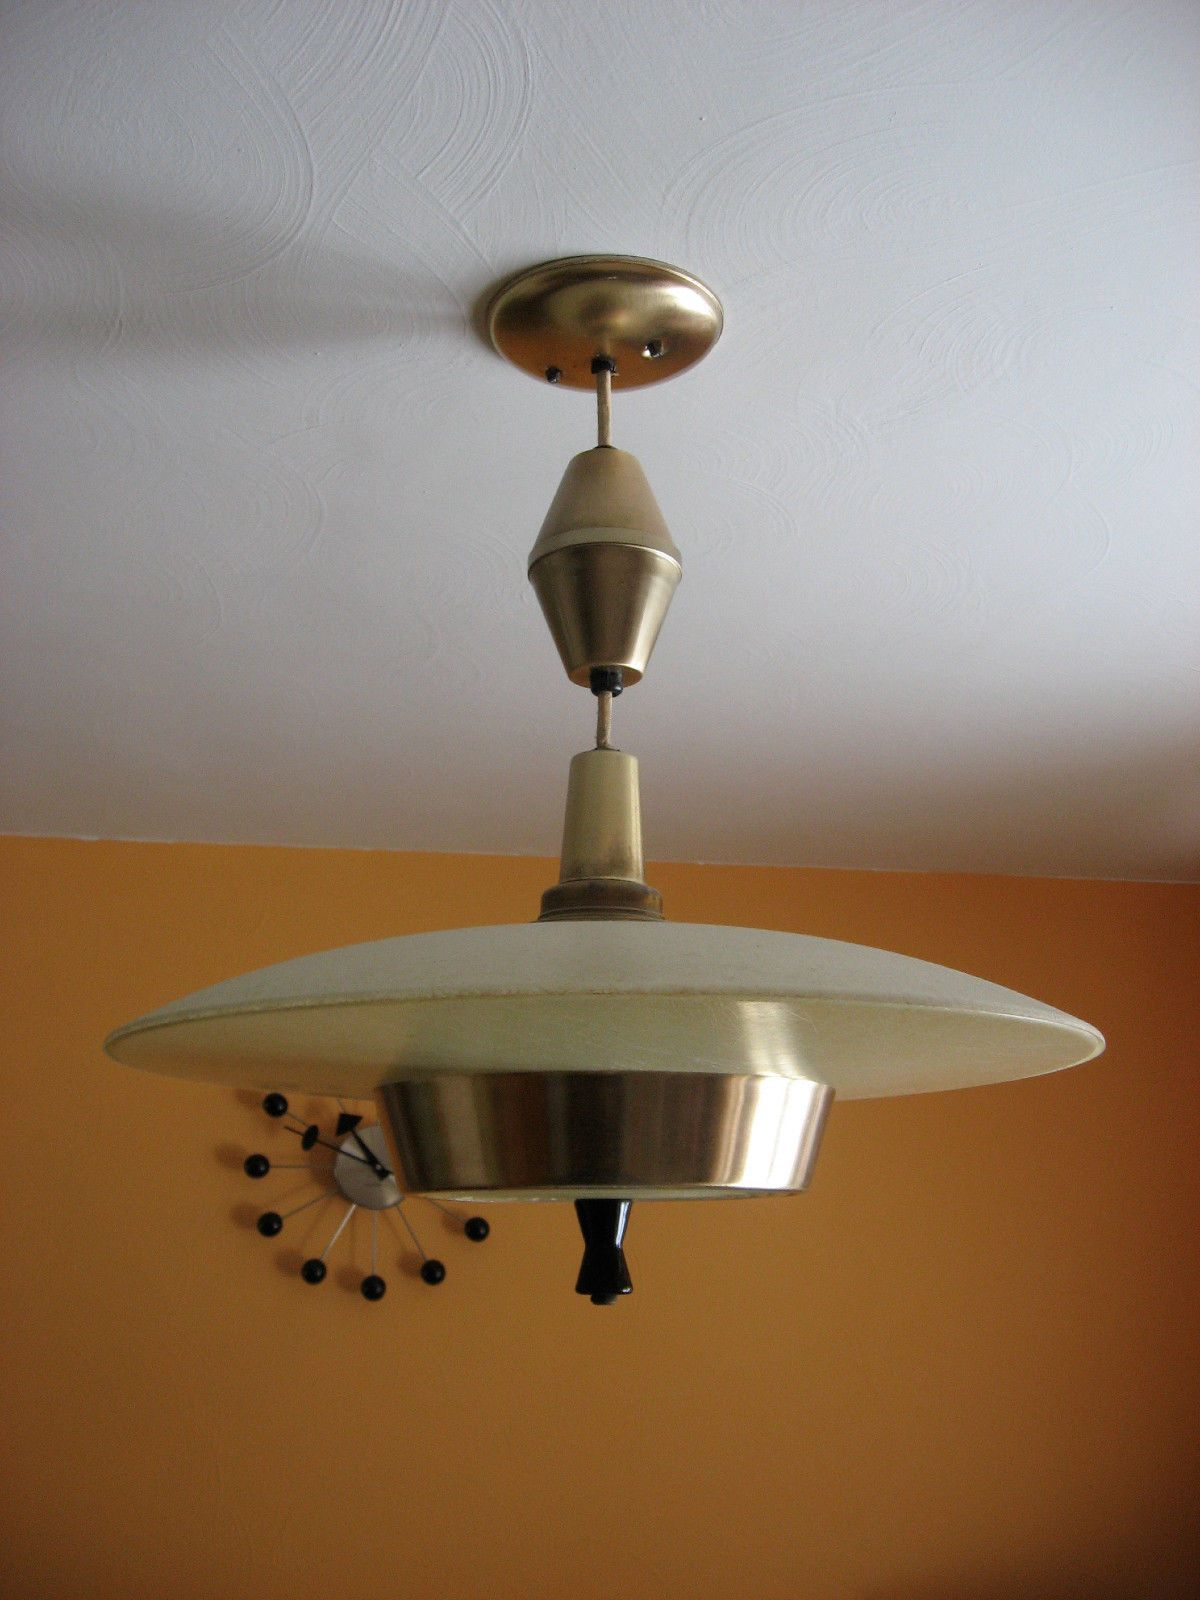 Vintage mid century modern atomic ufo fiberglass moe light pull vintage mid century modern atomic ufo fiberglass moe light pull hanging light ebay 150 arubaitofo Images